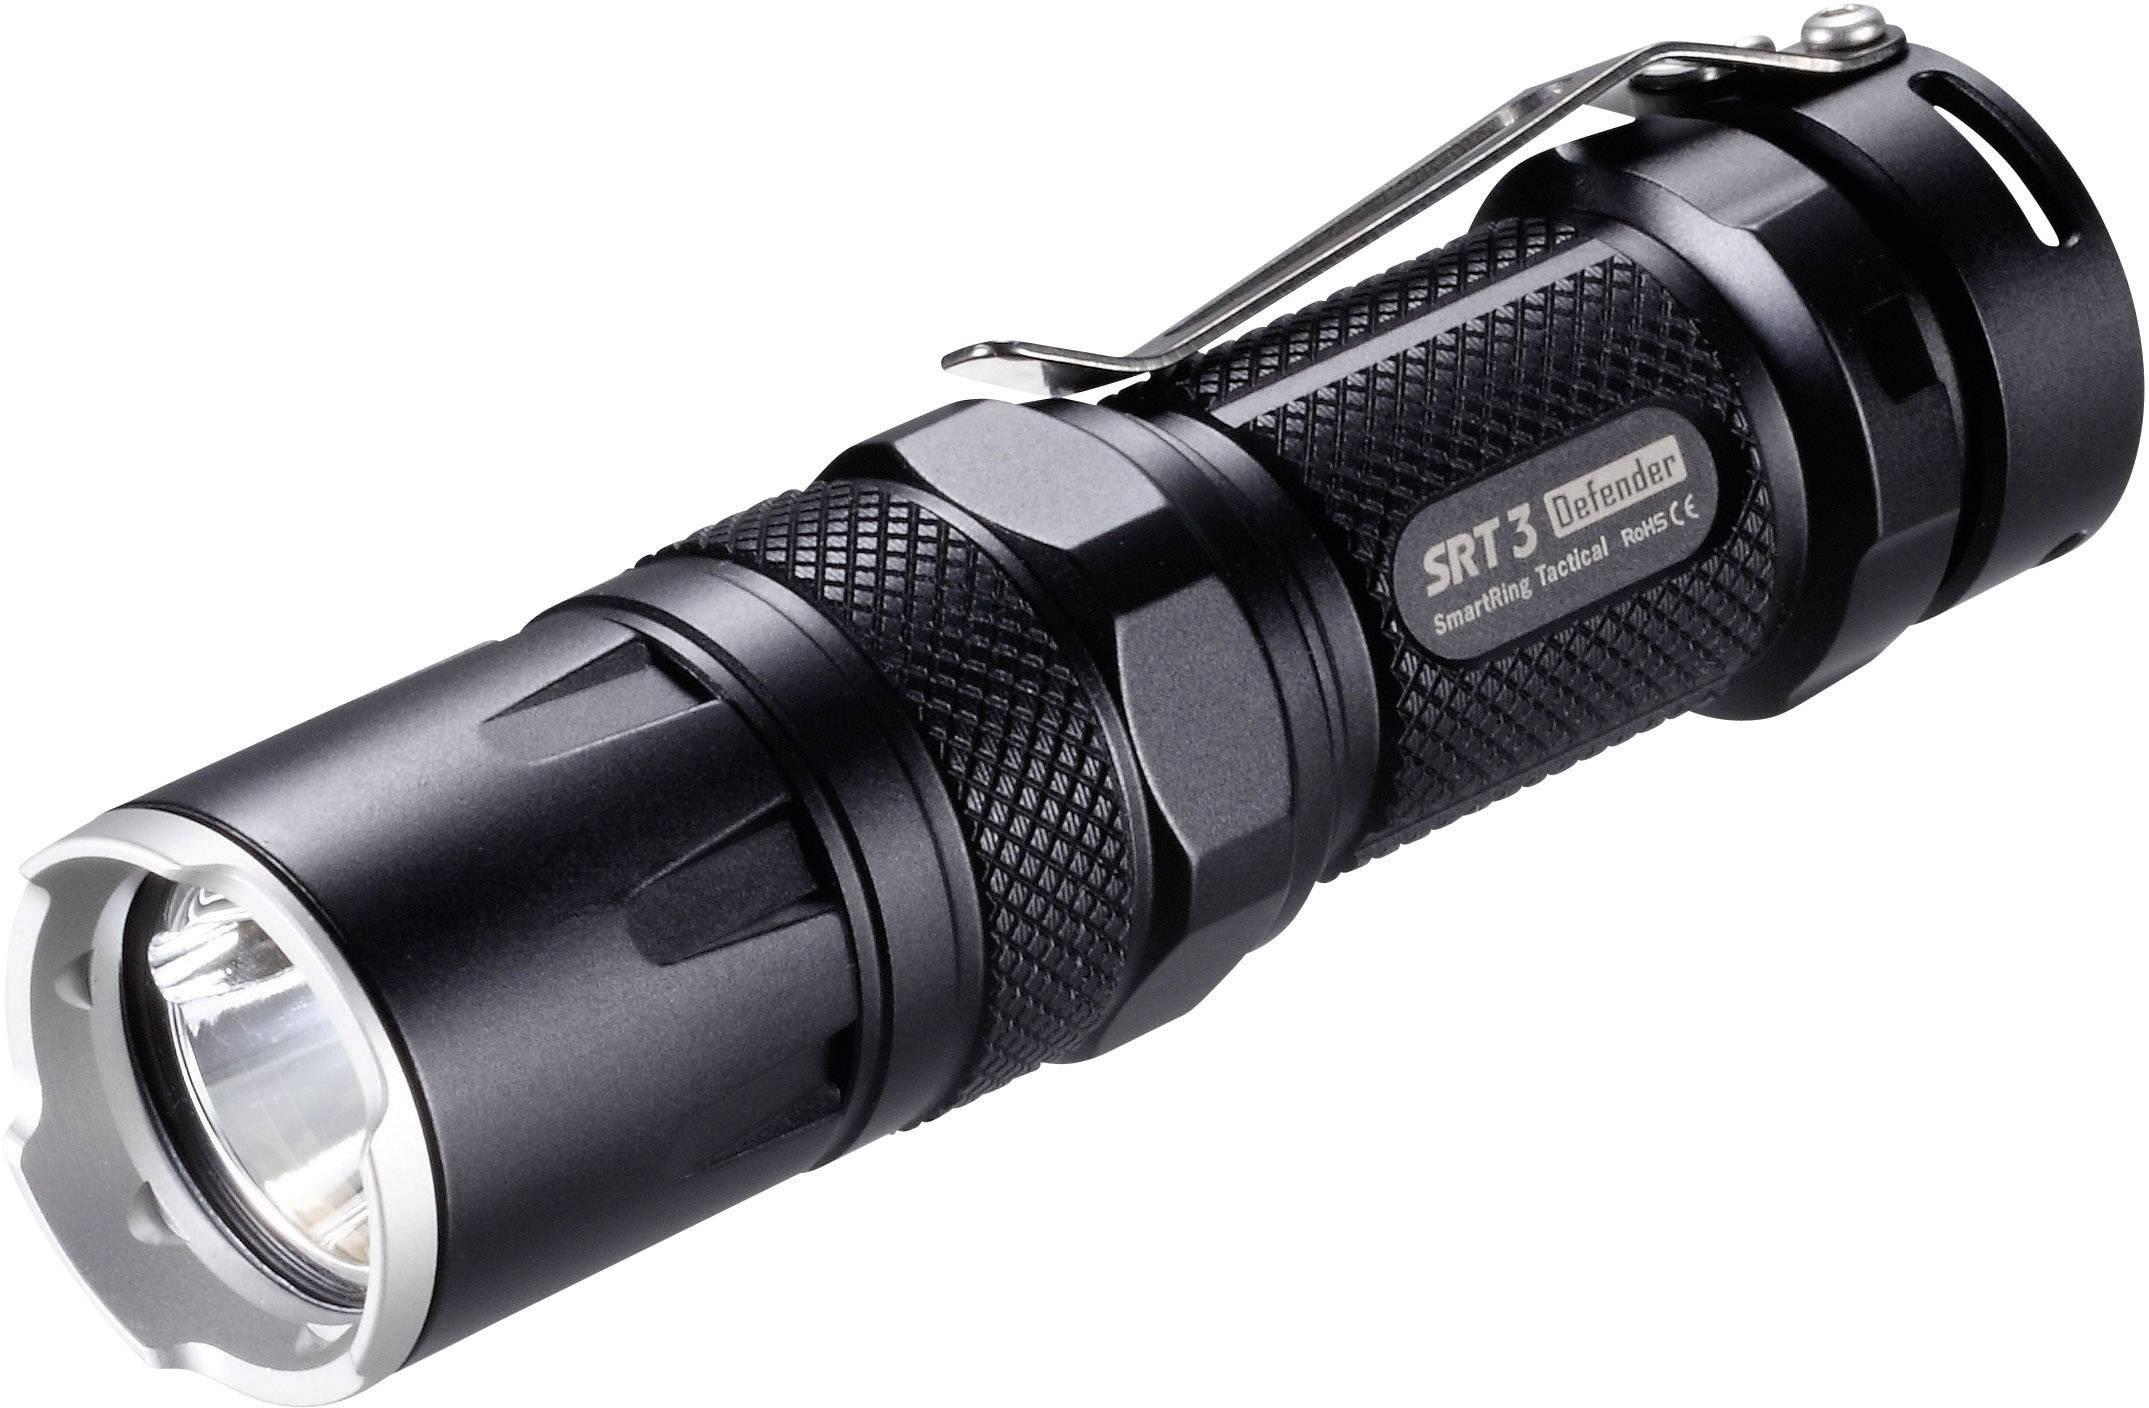 Zaklamp Rood Licht : Nitecore srt3 led zaklamp werkt op batterijen 550 lm 150 h 87 g